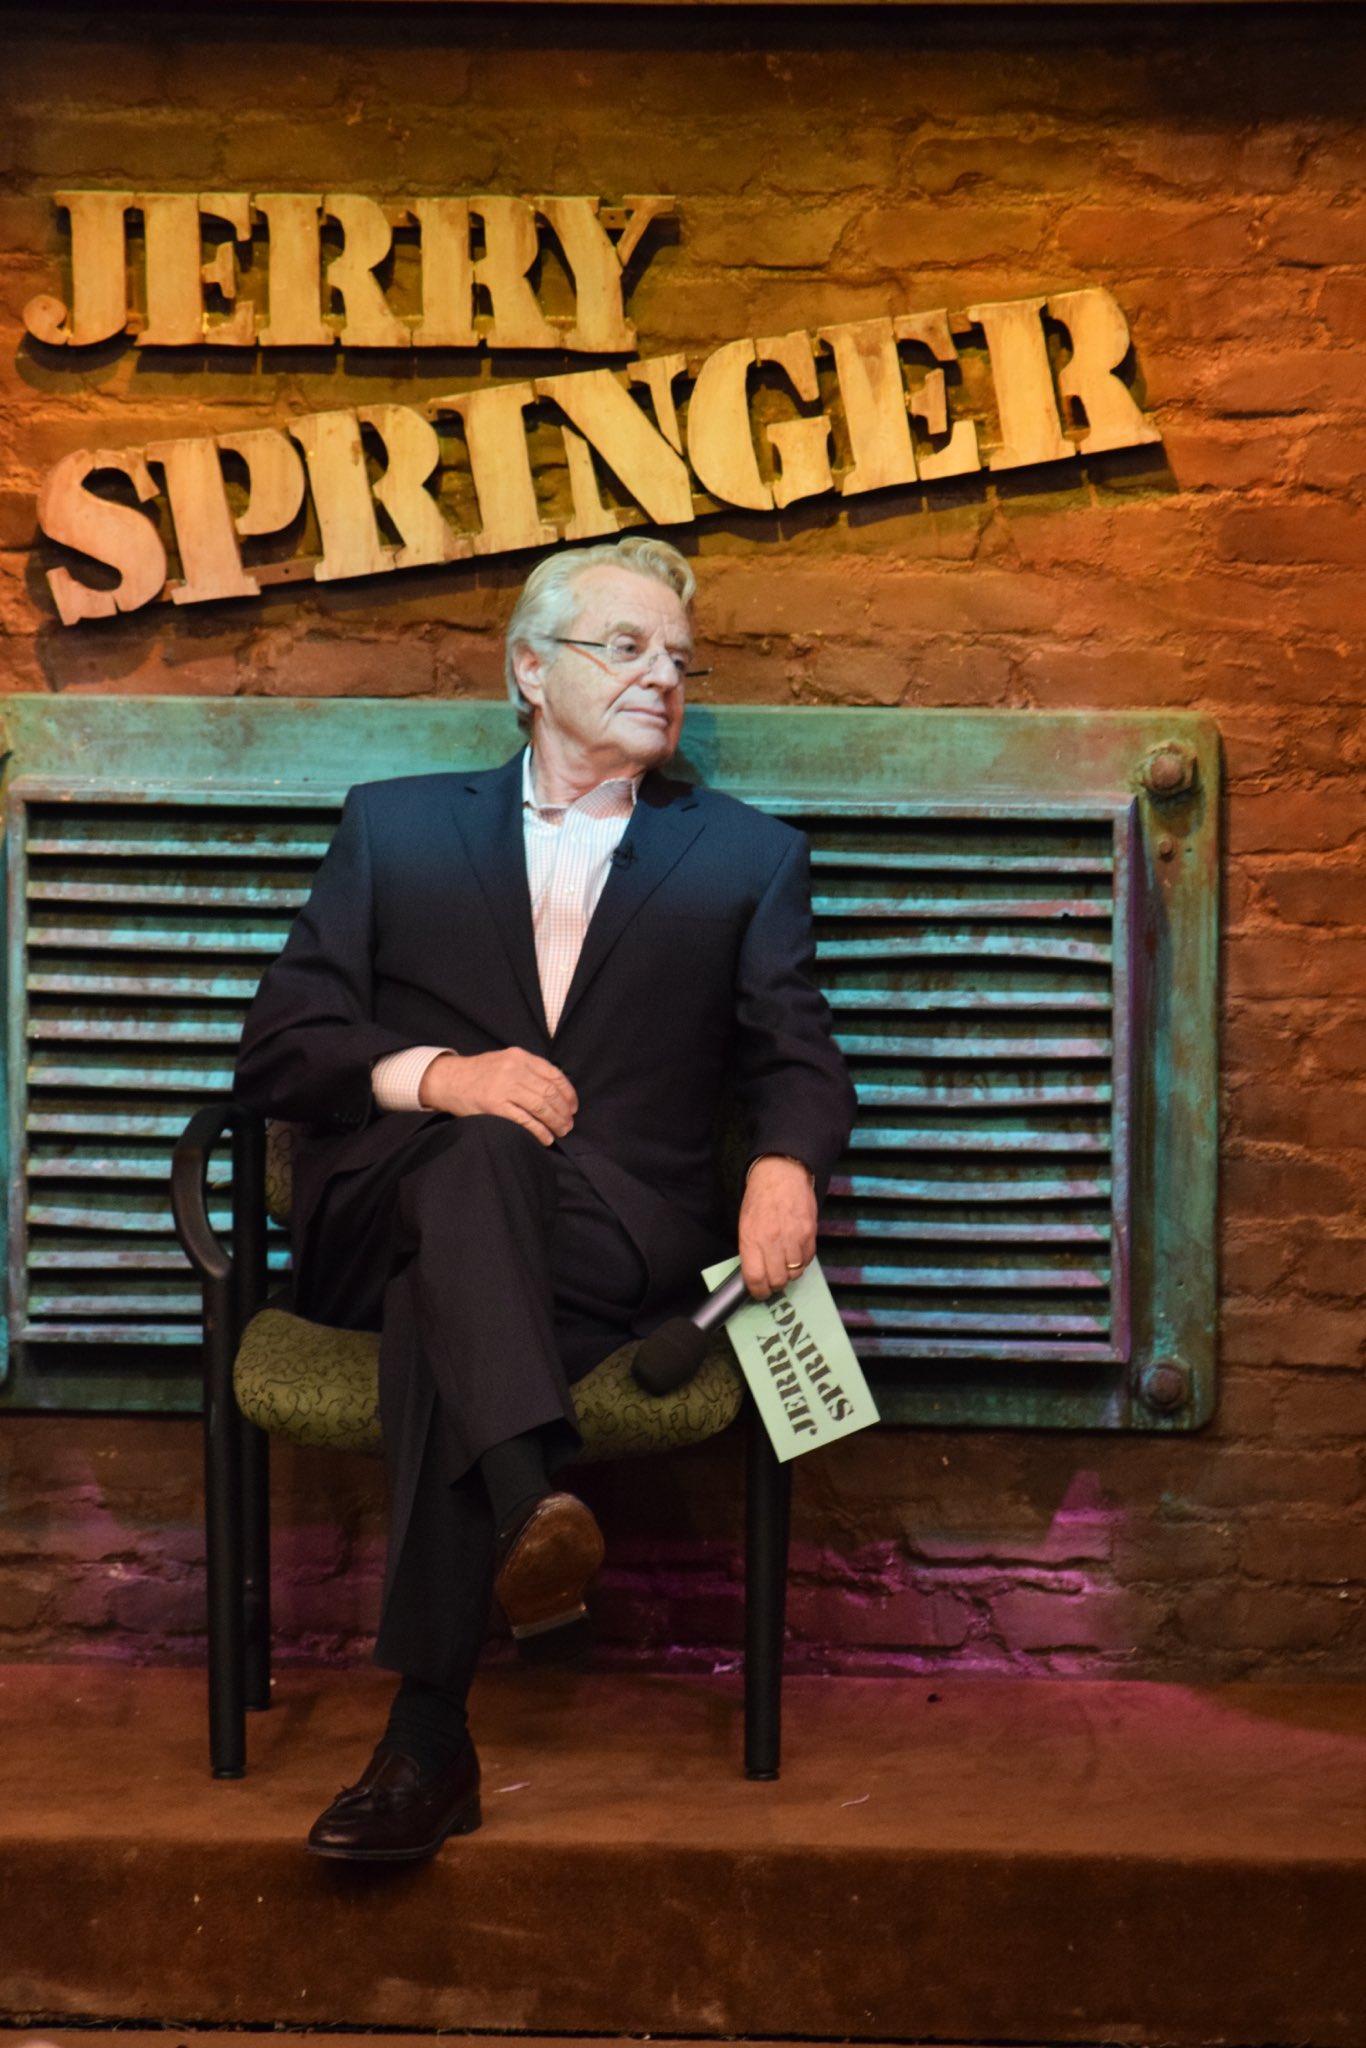 Jerry Springer